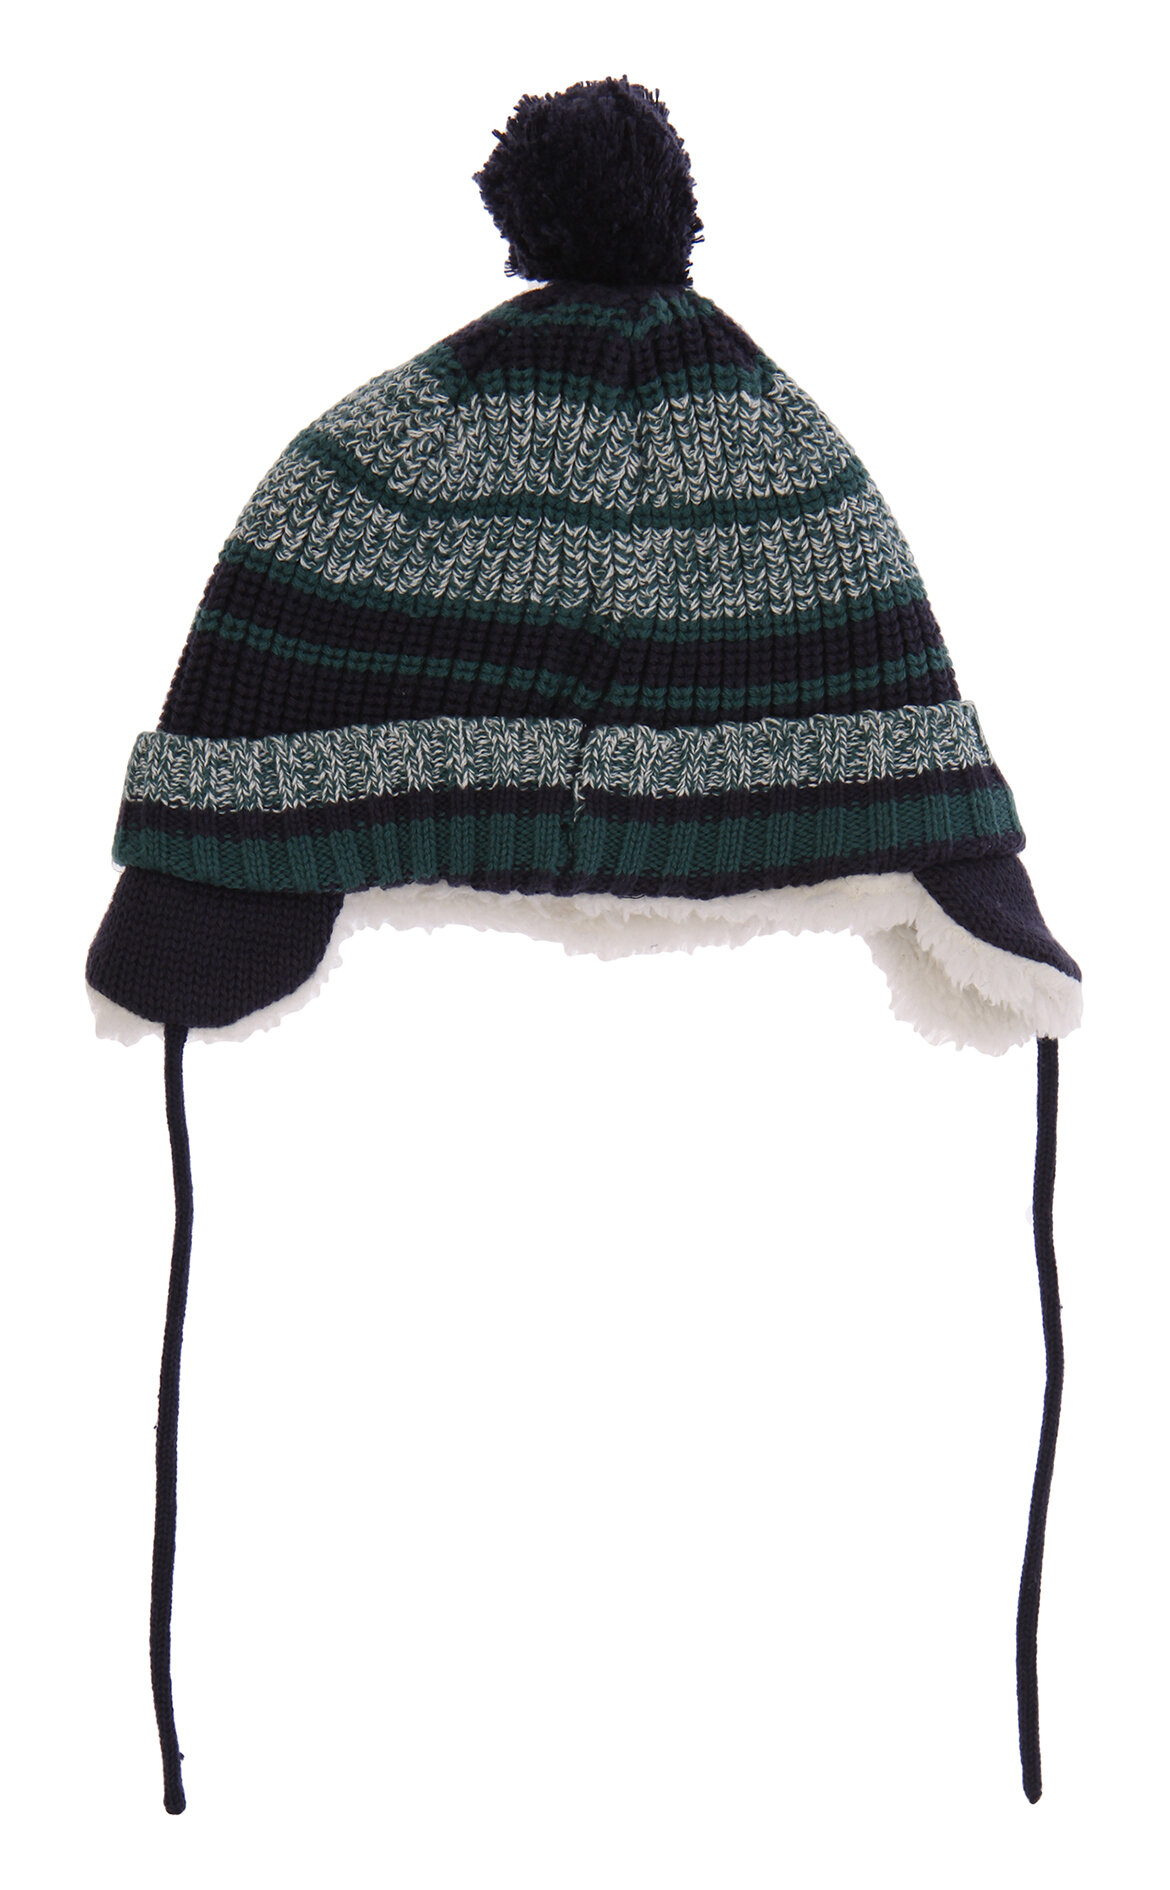 Cadet Rousselle-Cadet Rousselle Şapka